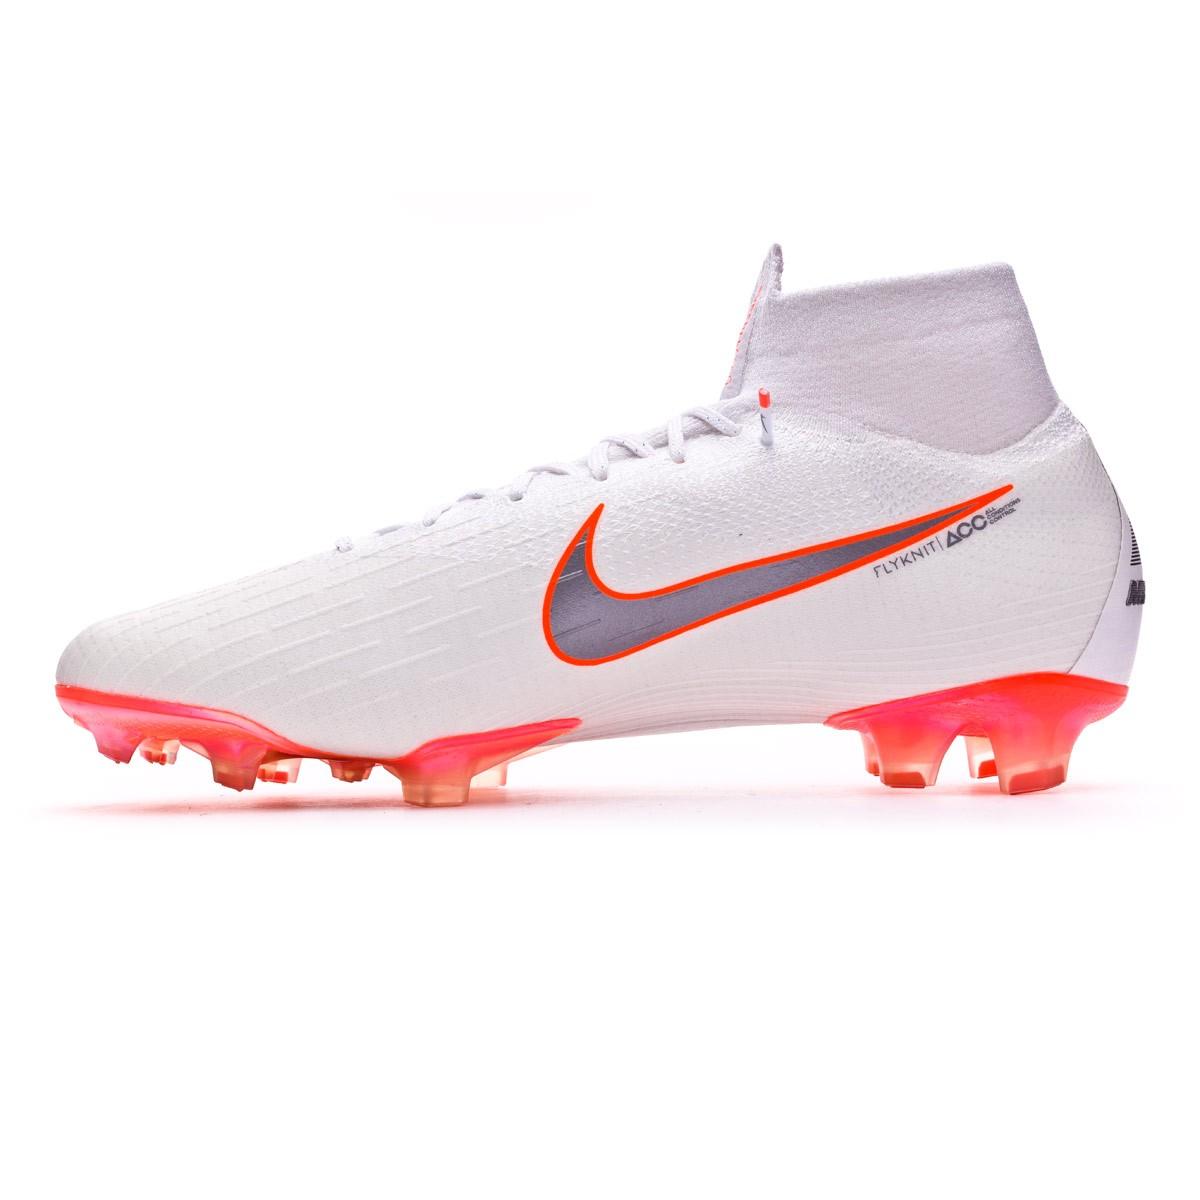 a5f595adacf1 Football Boots Nike Mercurial Superfly VI Elite FG White-Metallic cool grey-Total  orange - Tienda de fútbol Fútbol Emotion